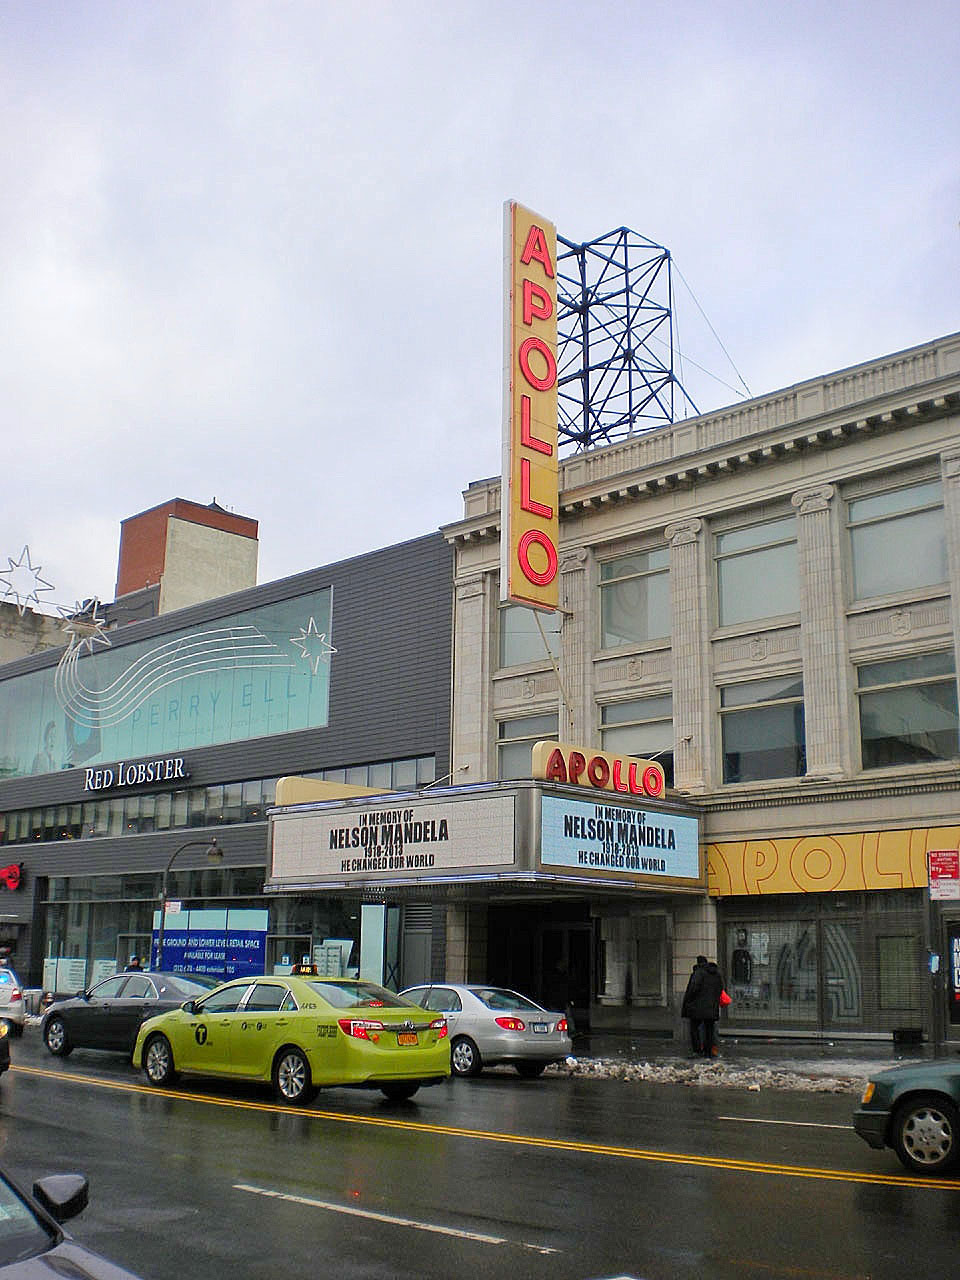 new-york-apollo-theatre-harlem